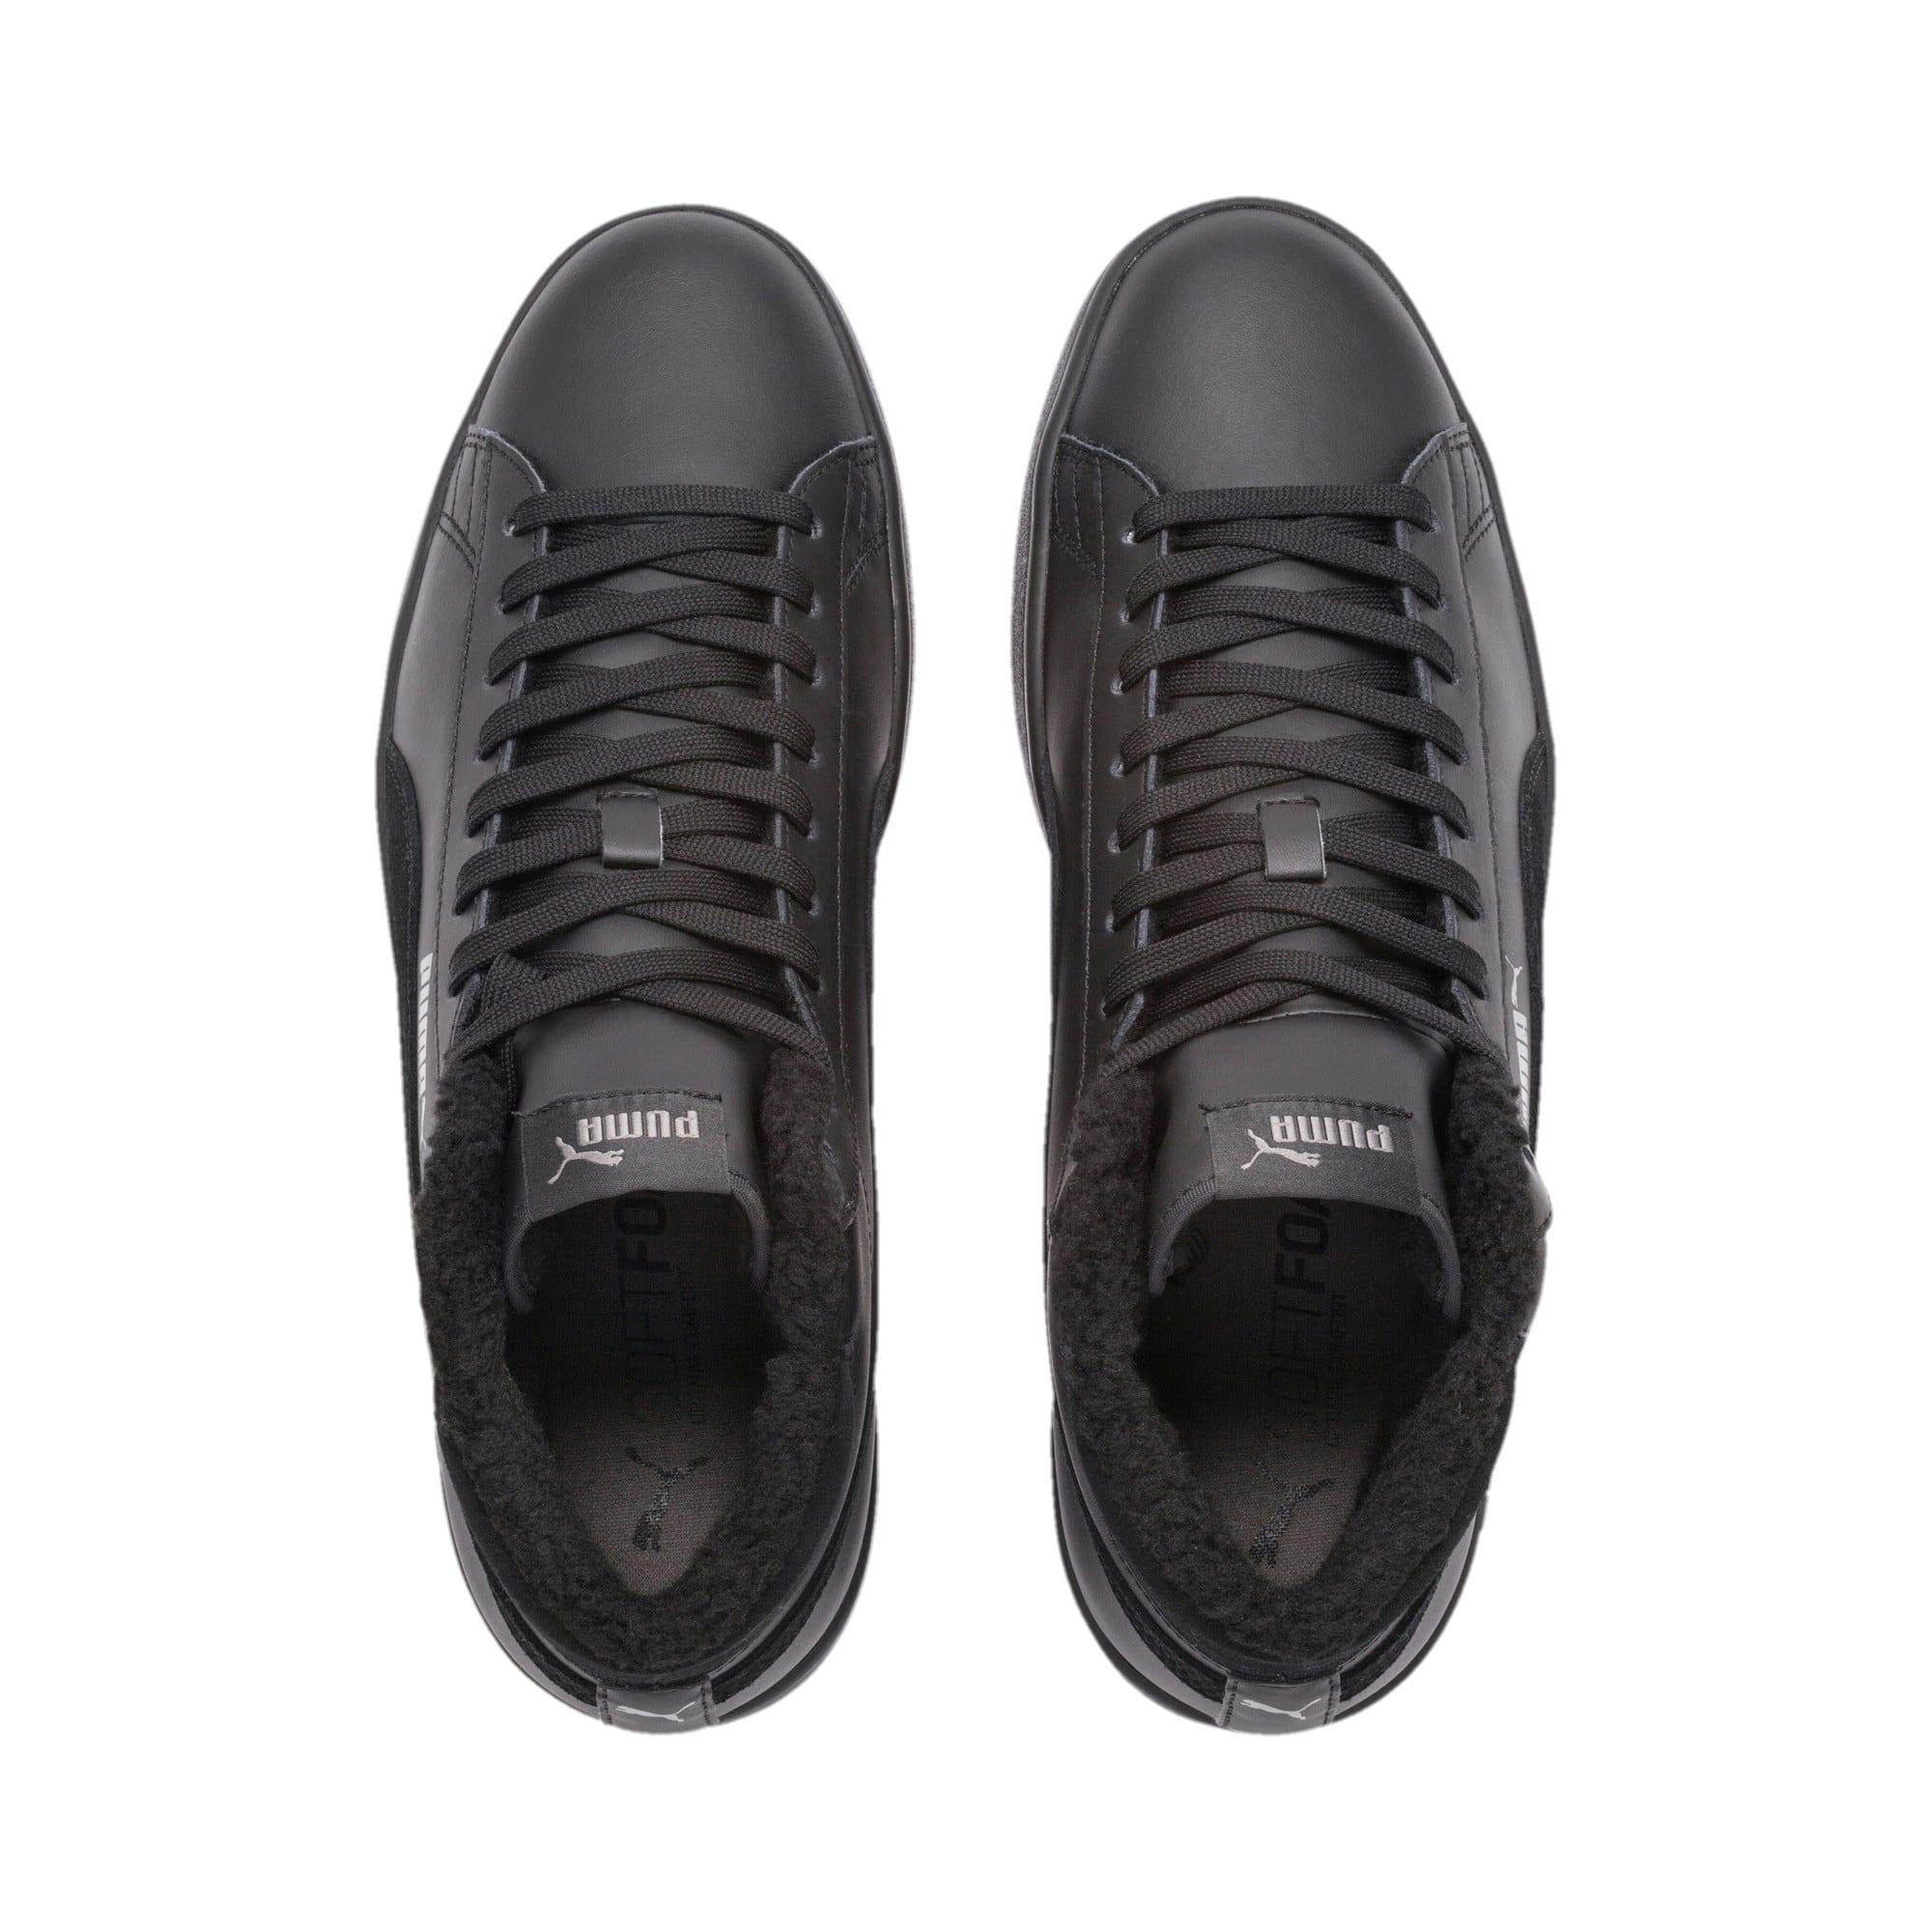 Thumbnail 7 of Smash v2 Mid Winterized Leather High Tops, Puma Black-CASTLEROCK, medium